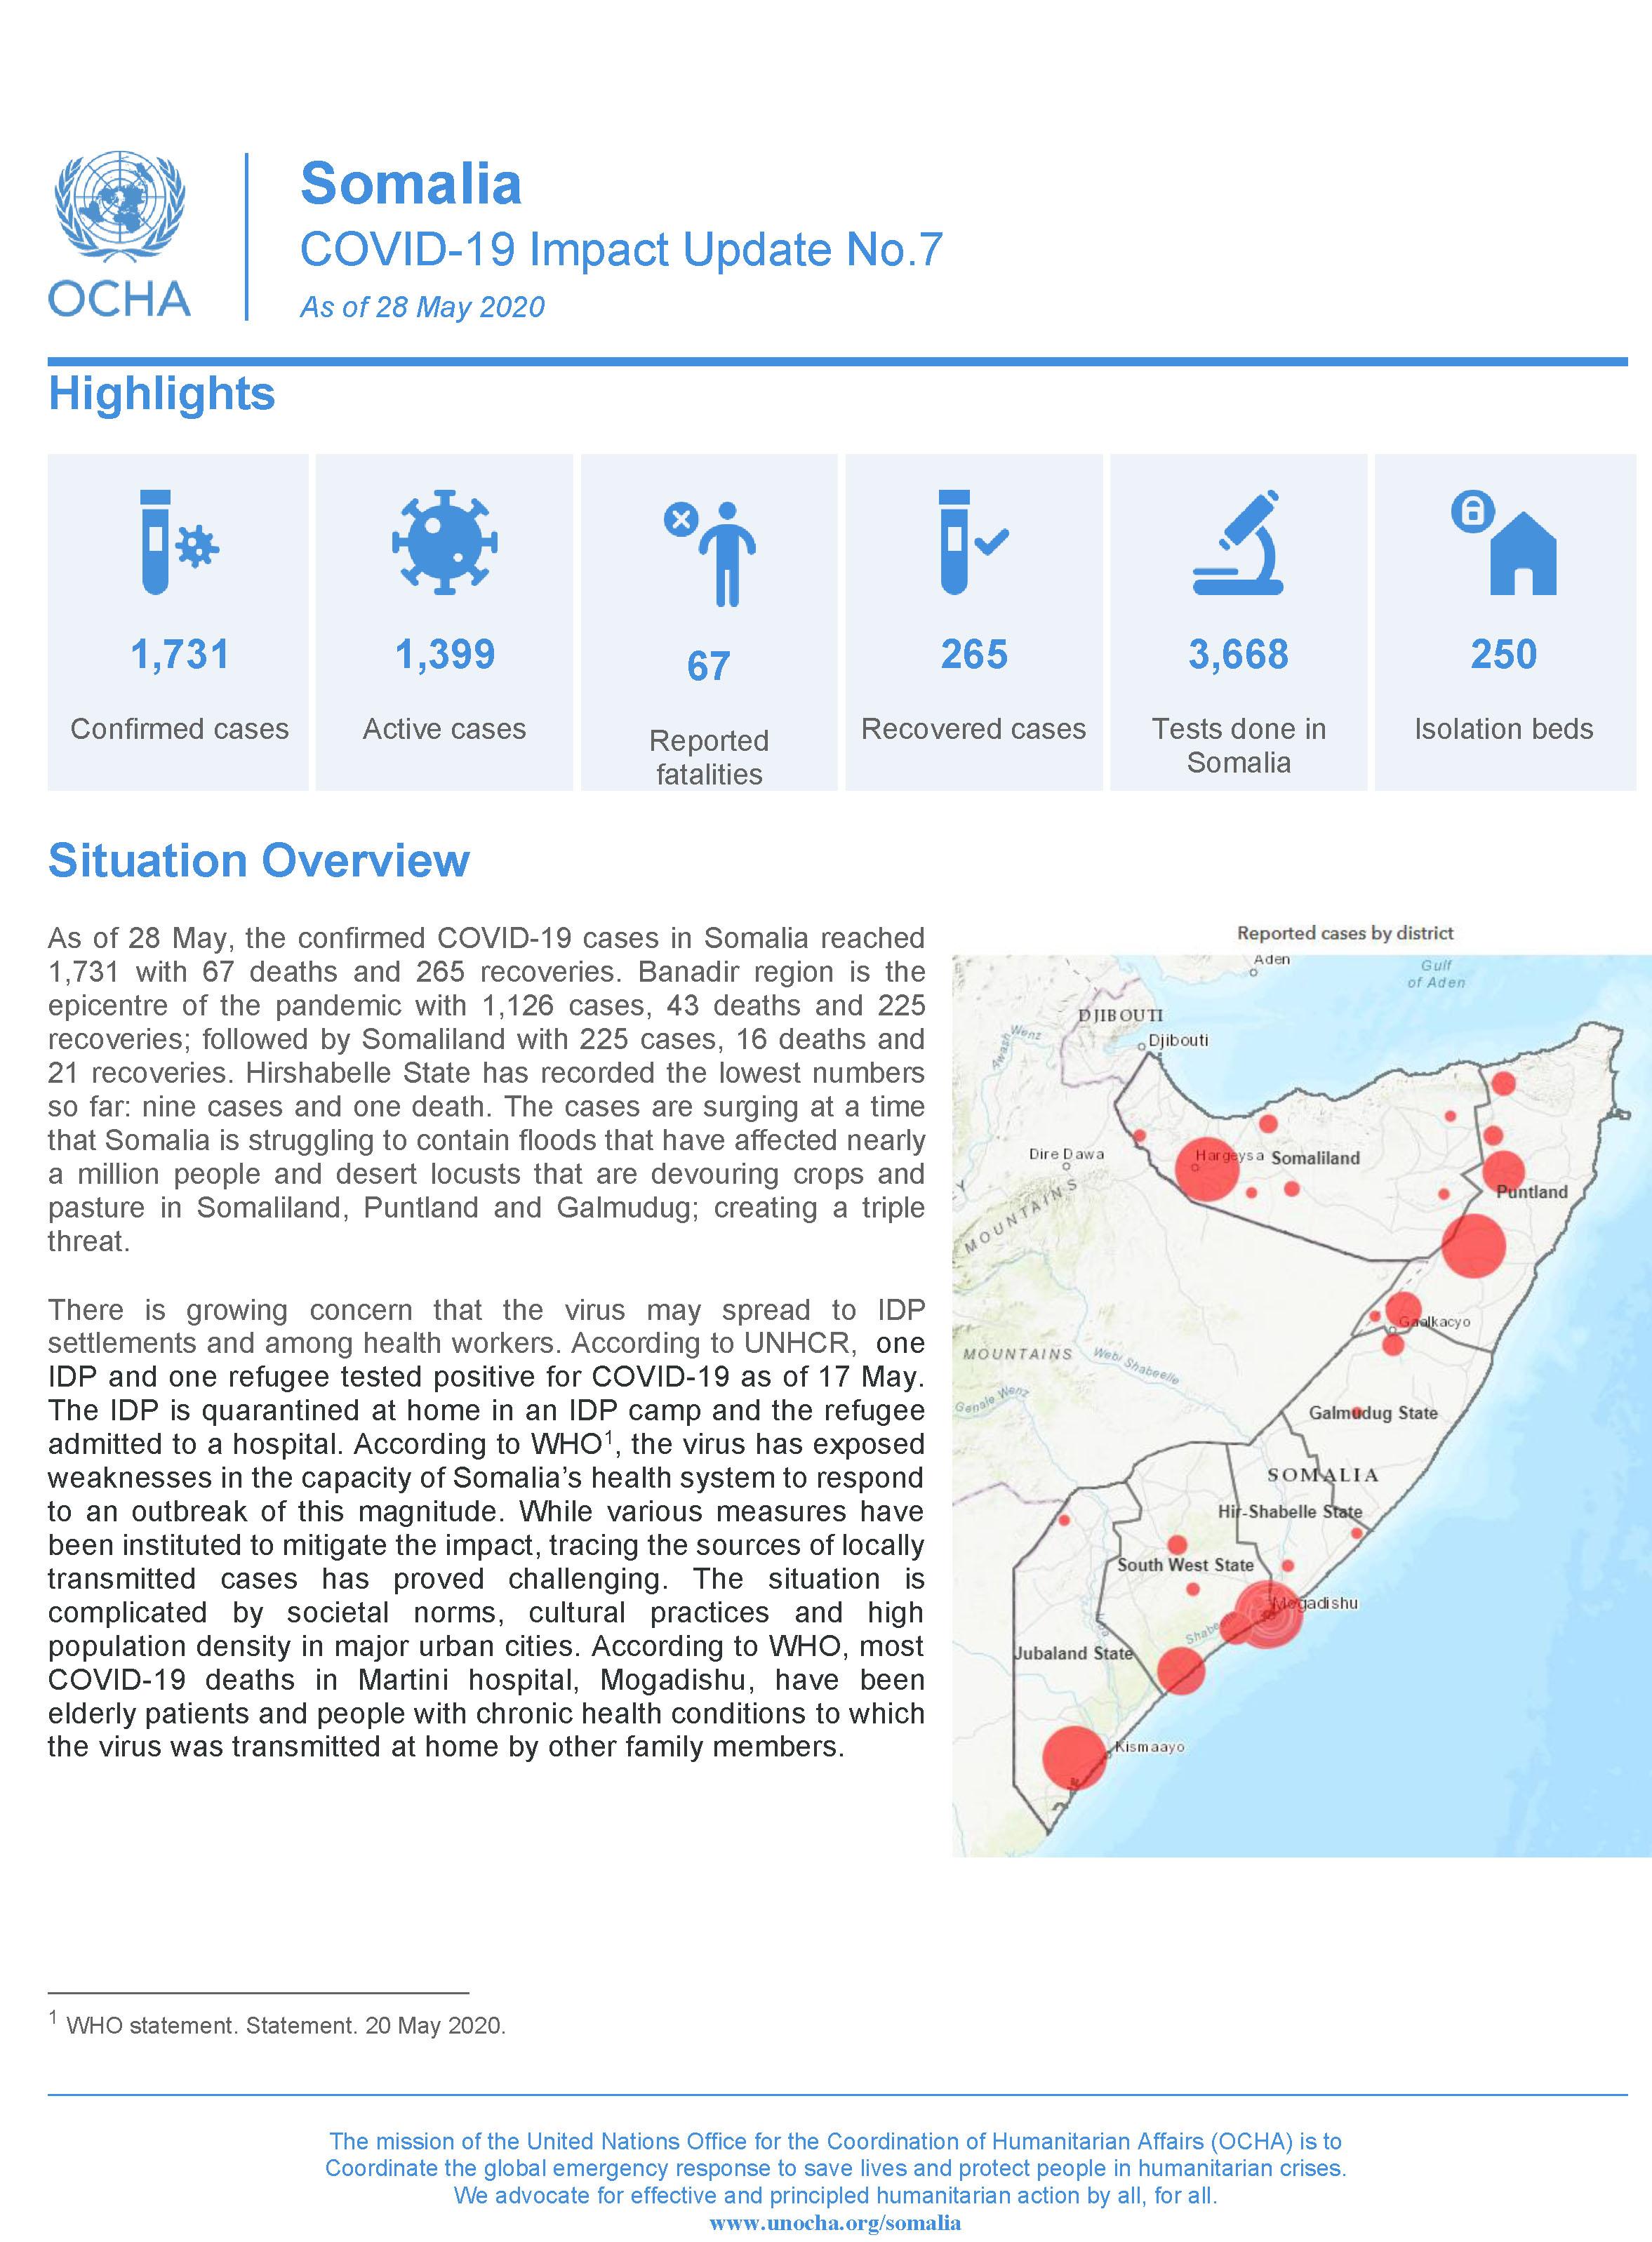 Somalia: COVID-19 Impact Update No. 7 (As of 28 May 2020)